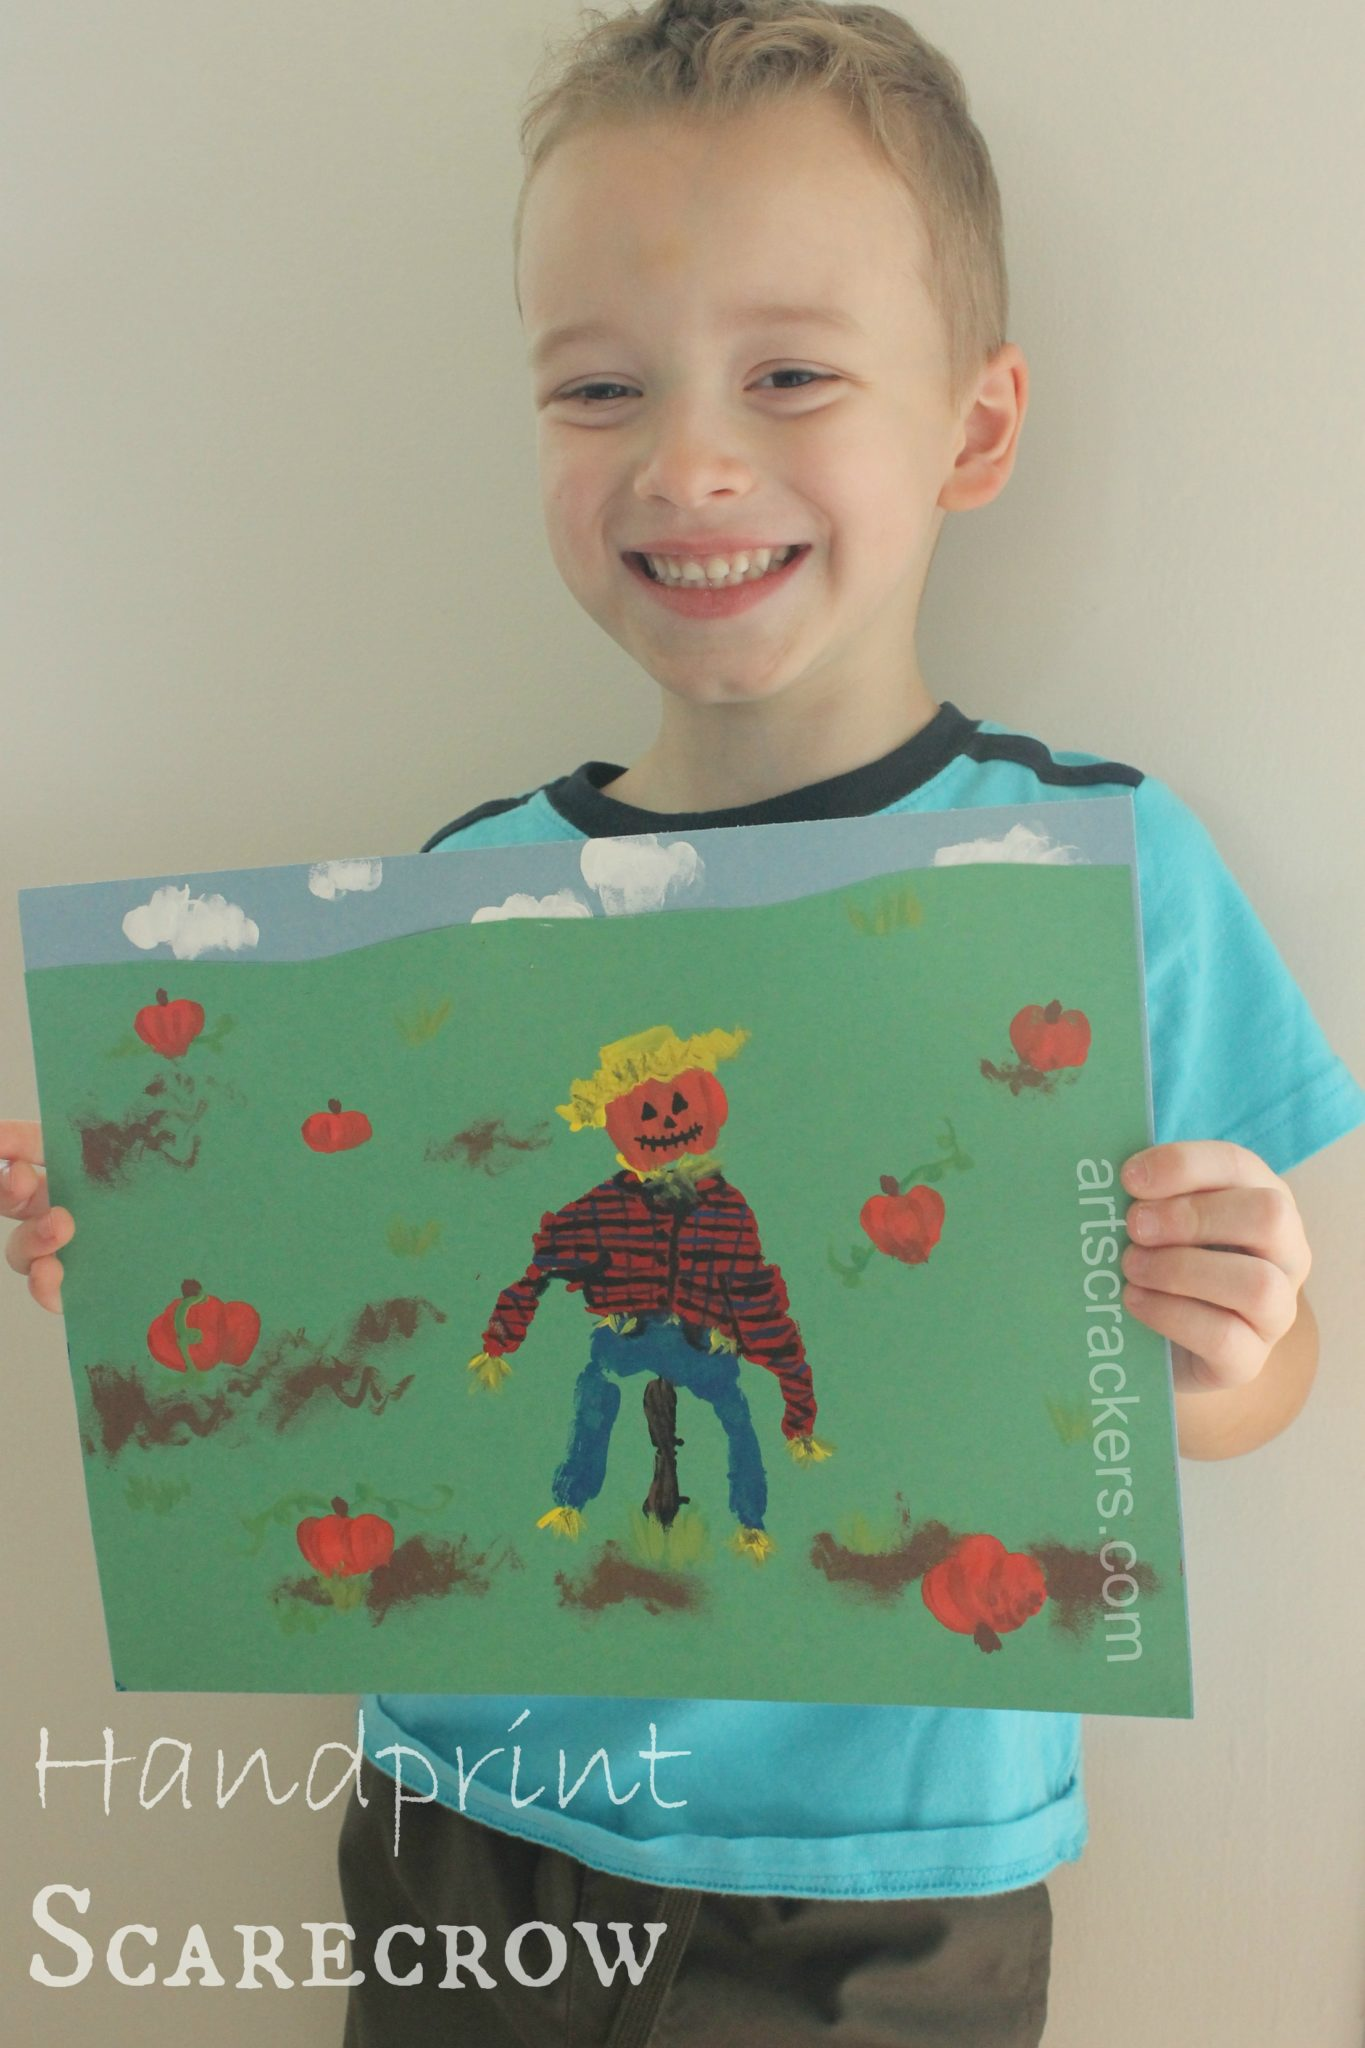 Handprint Scarecrow Art